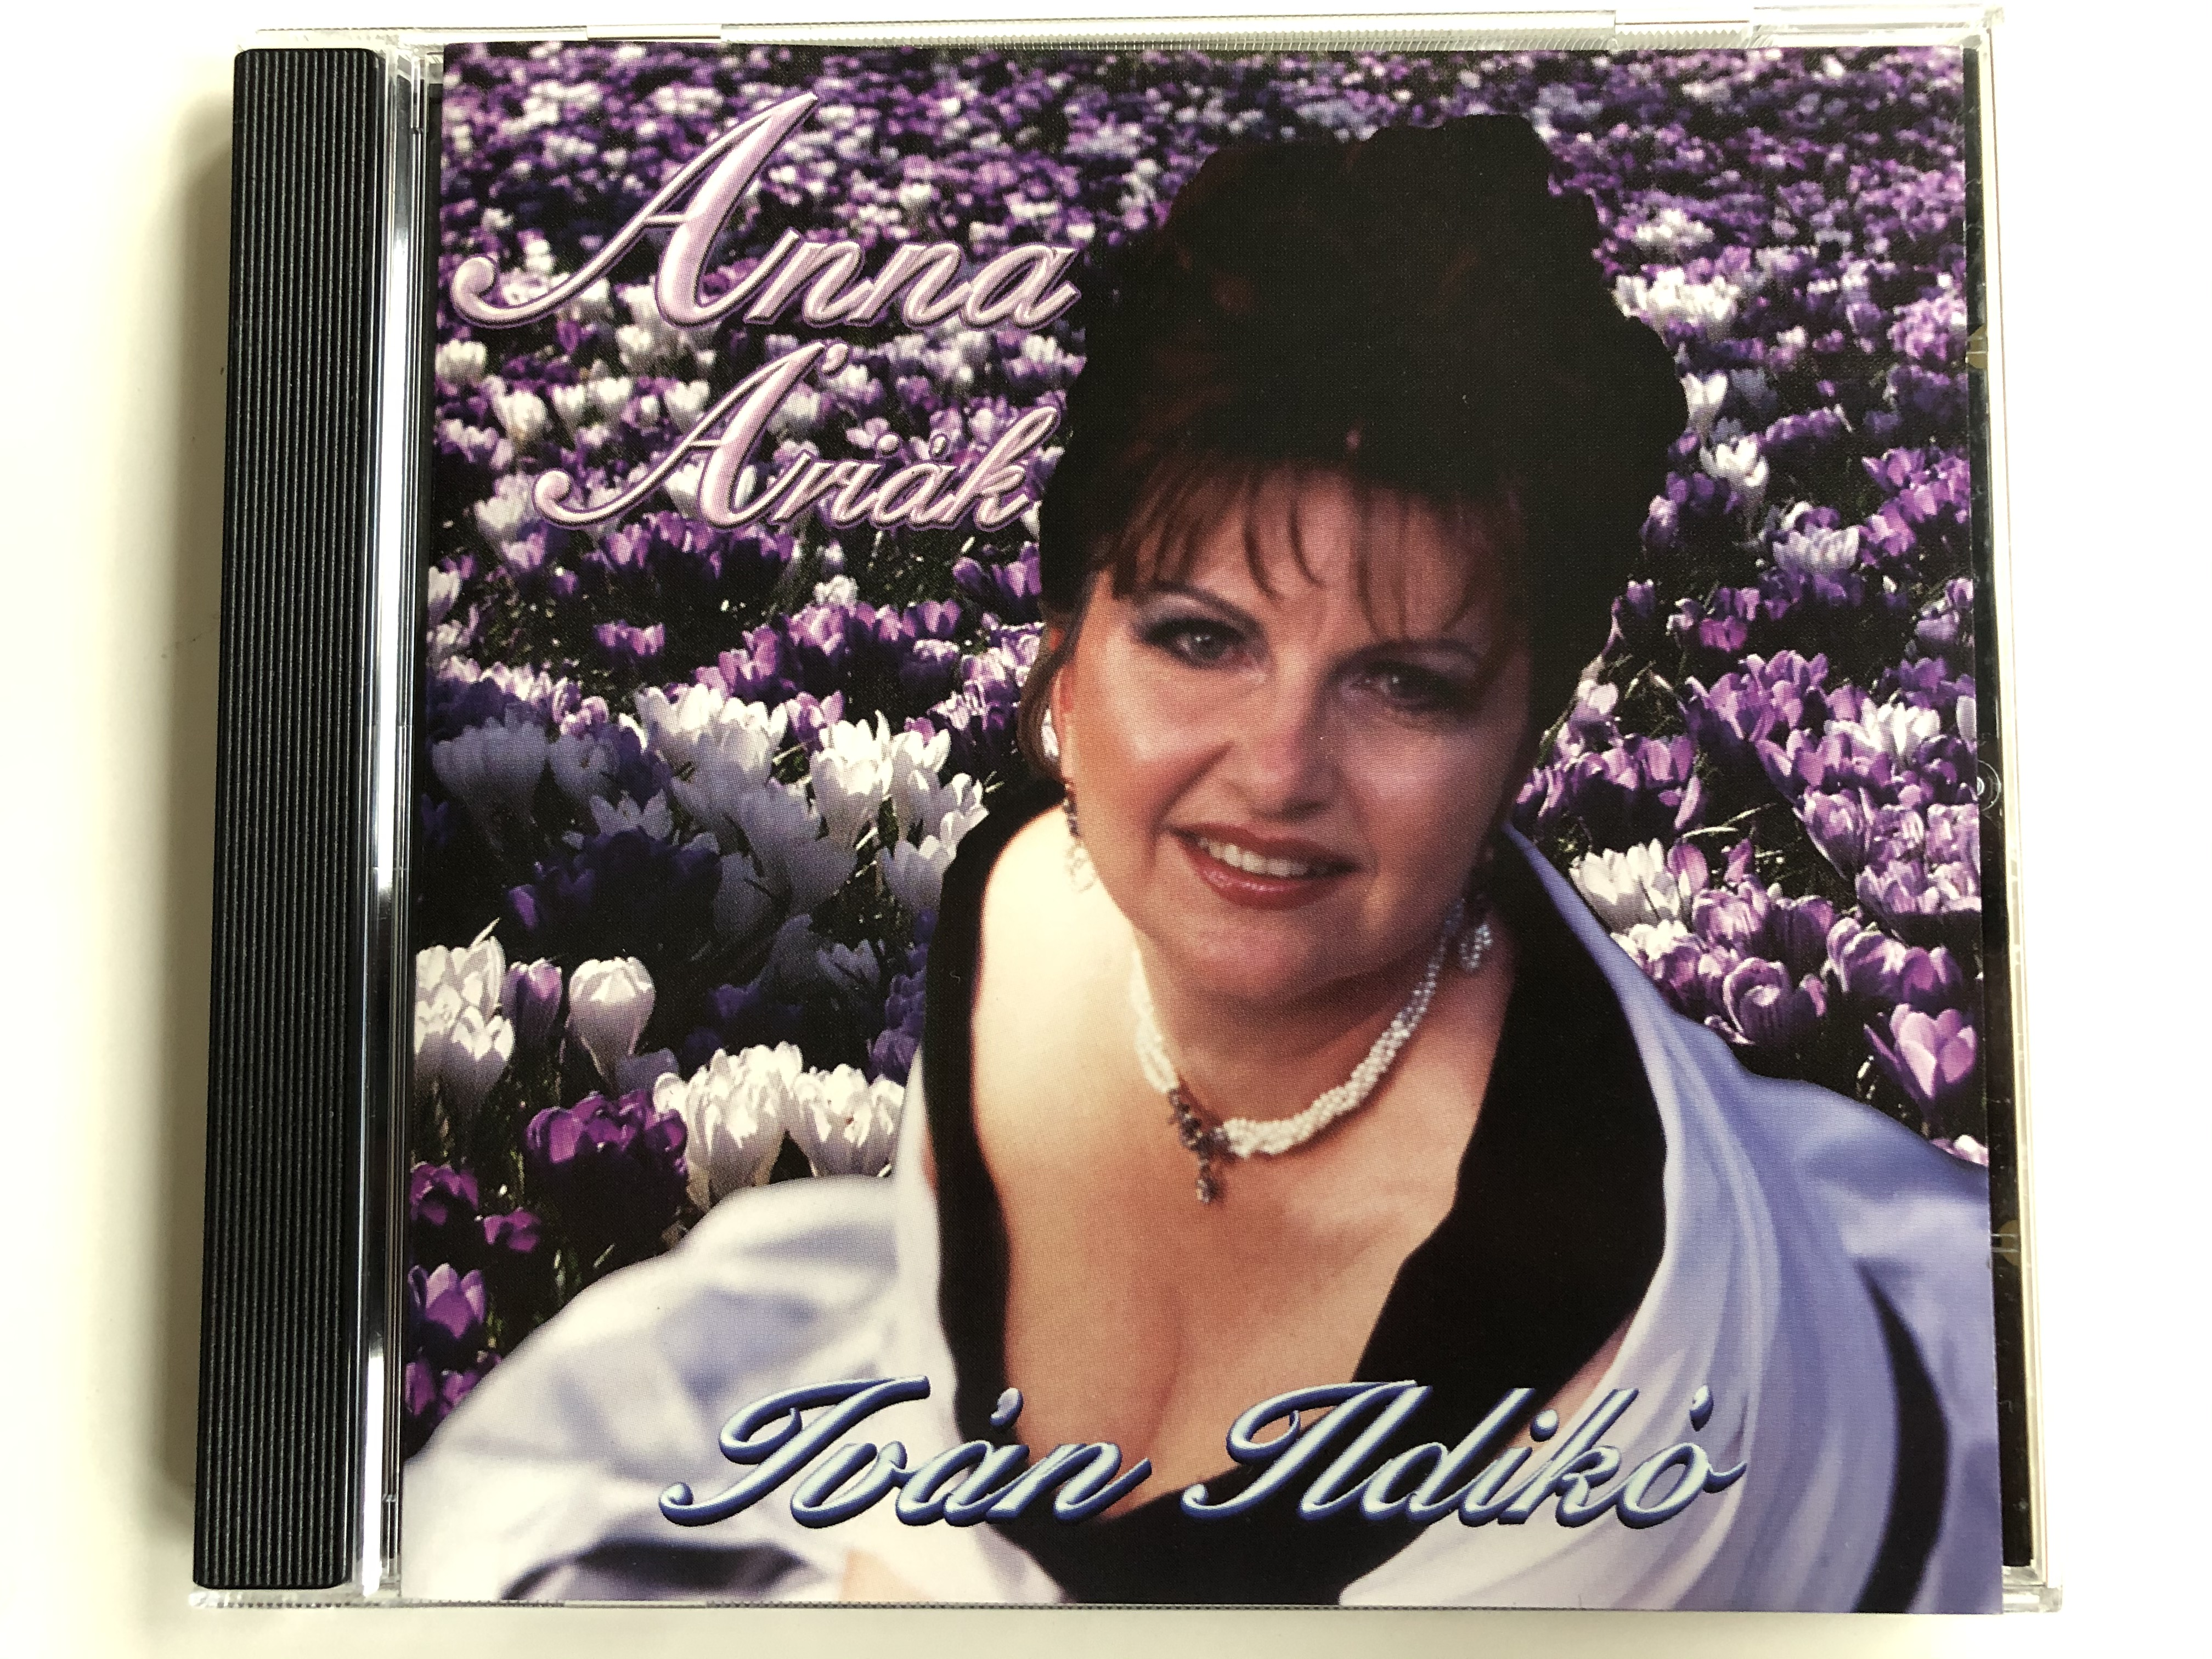 anna-ariak-ivan-ildiko-hungaroton-classic-audio-cd-2002-stereo-hcd-32173-1-.jpg